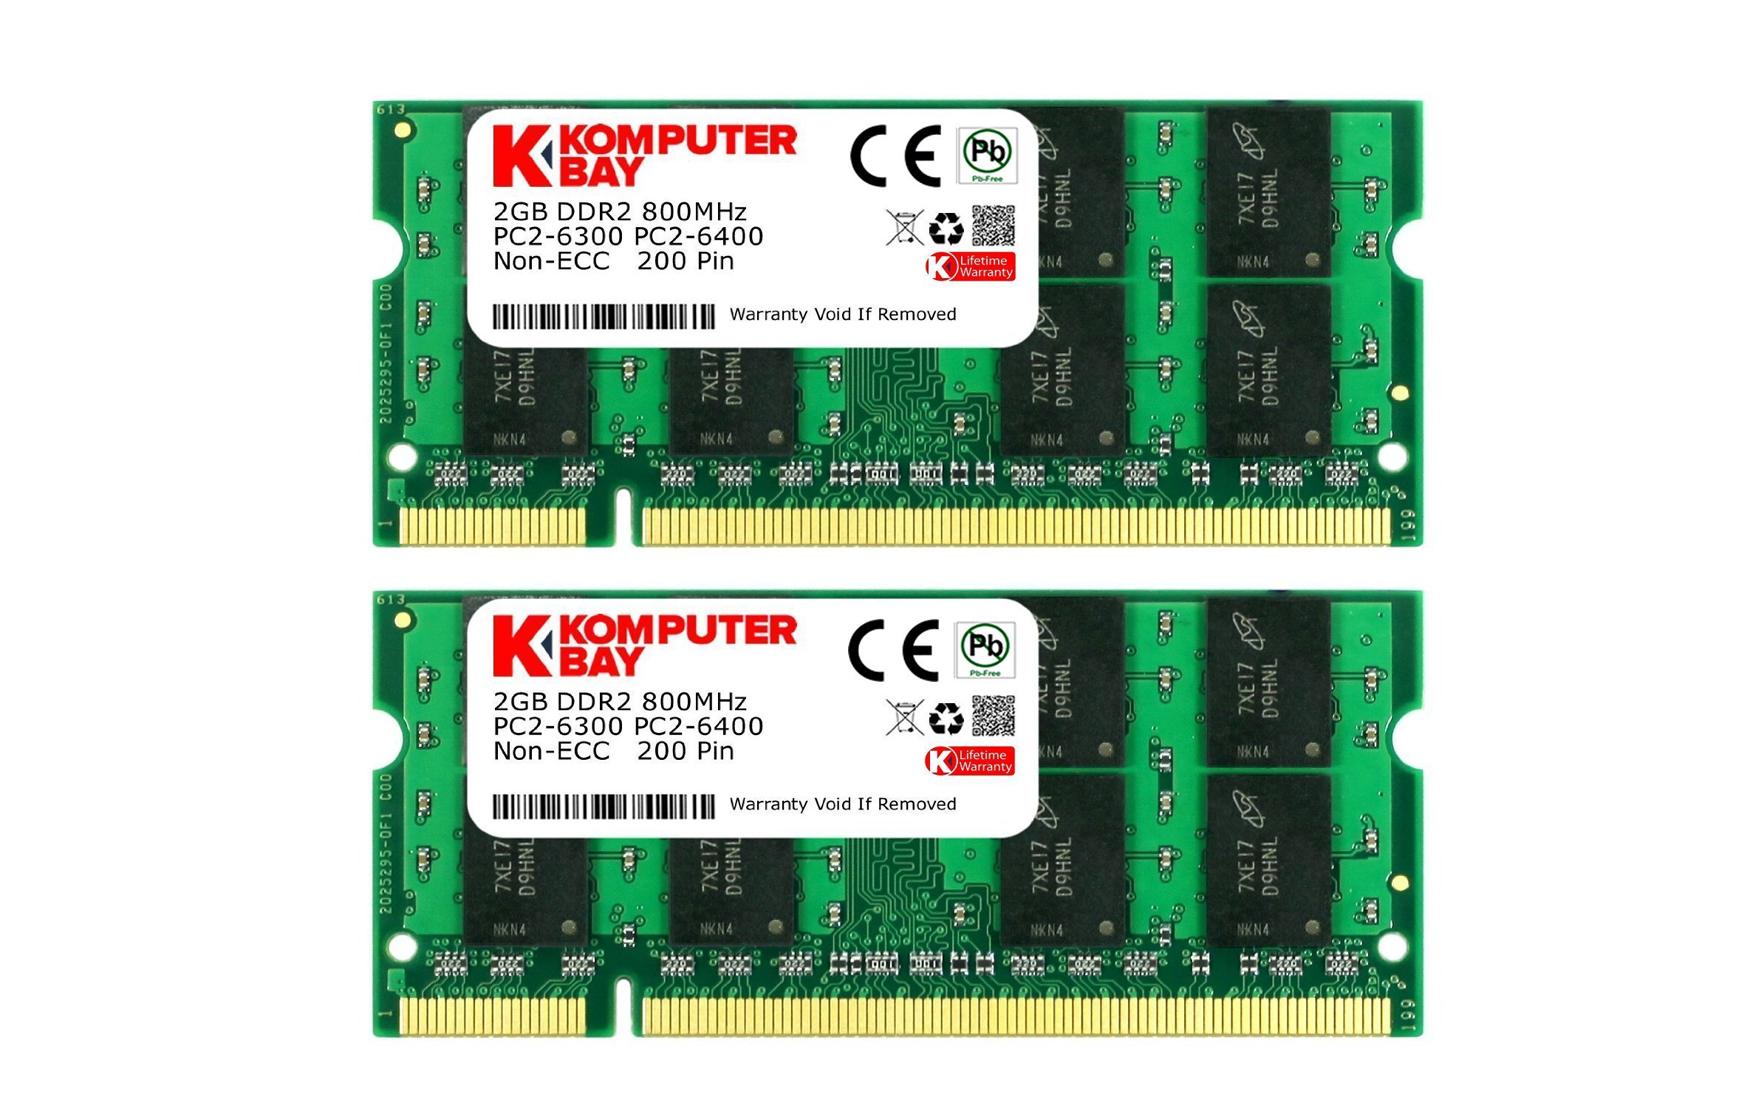 Komputerbay 4gb 2x 2gb Ddr2 800mhz Pc2 6300 6400 800 200 Sodimm 6400s Pin Laptop Memory Ecommerce Juice